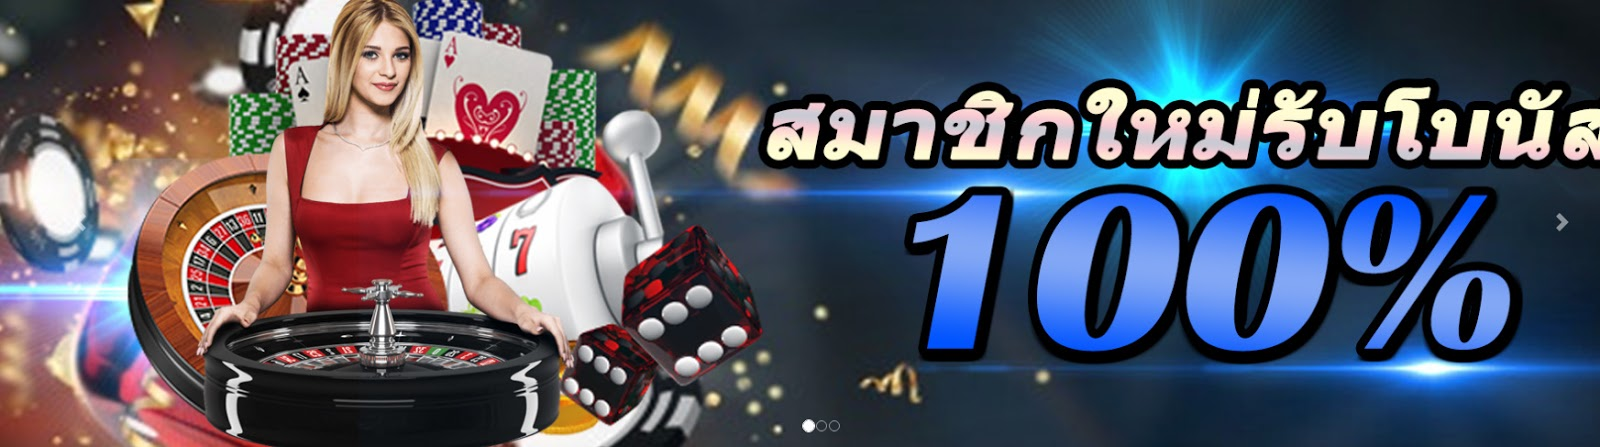 FAFA191 happylukecasino situs judi online sbobet